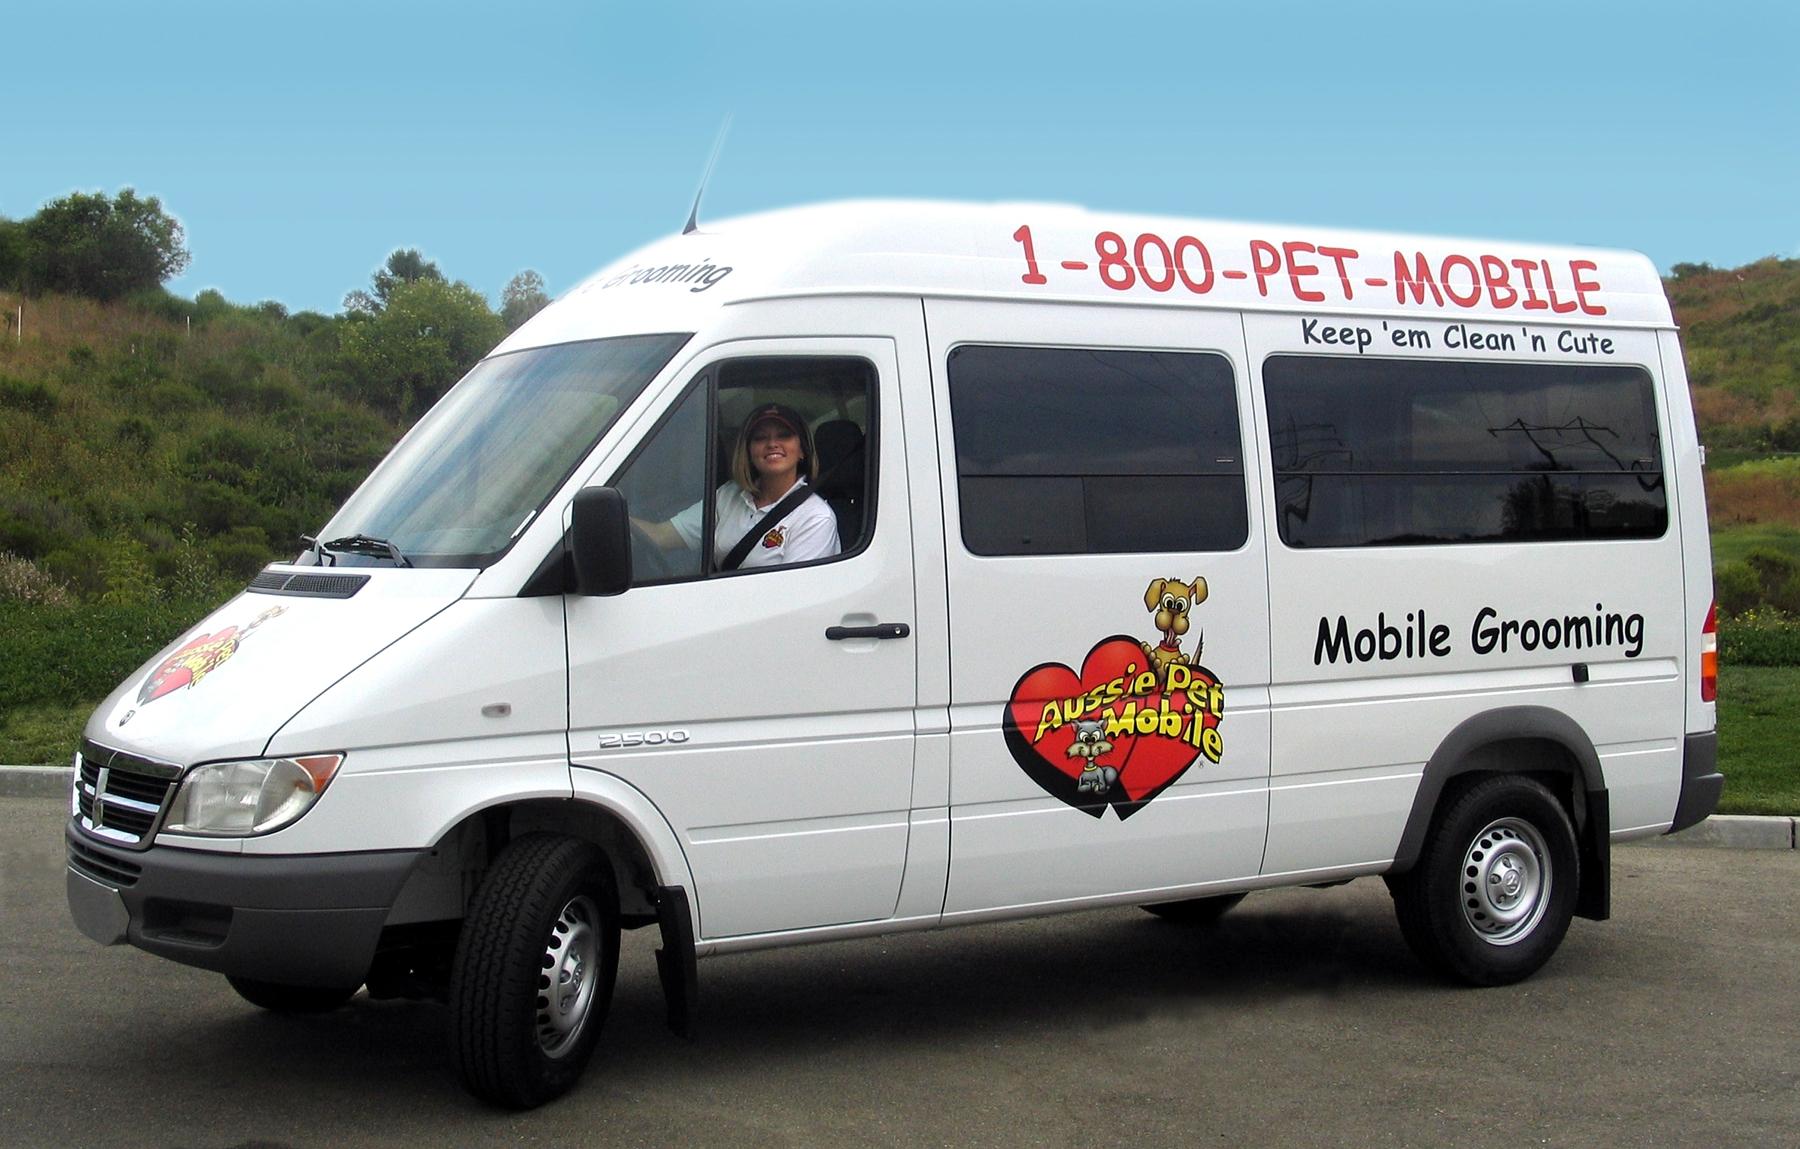 Mobile Grooming Vans For Sale | Autos Weblog